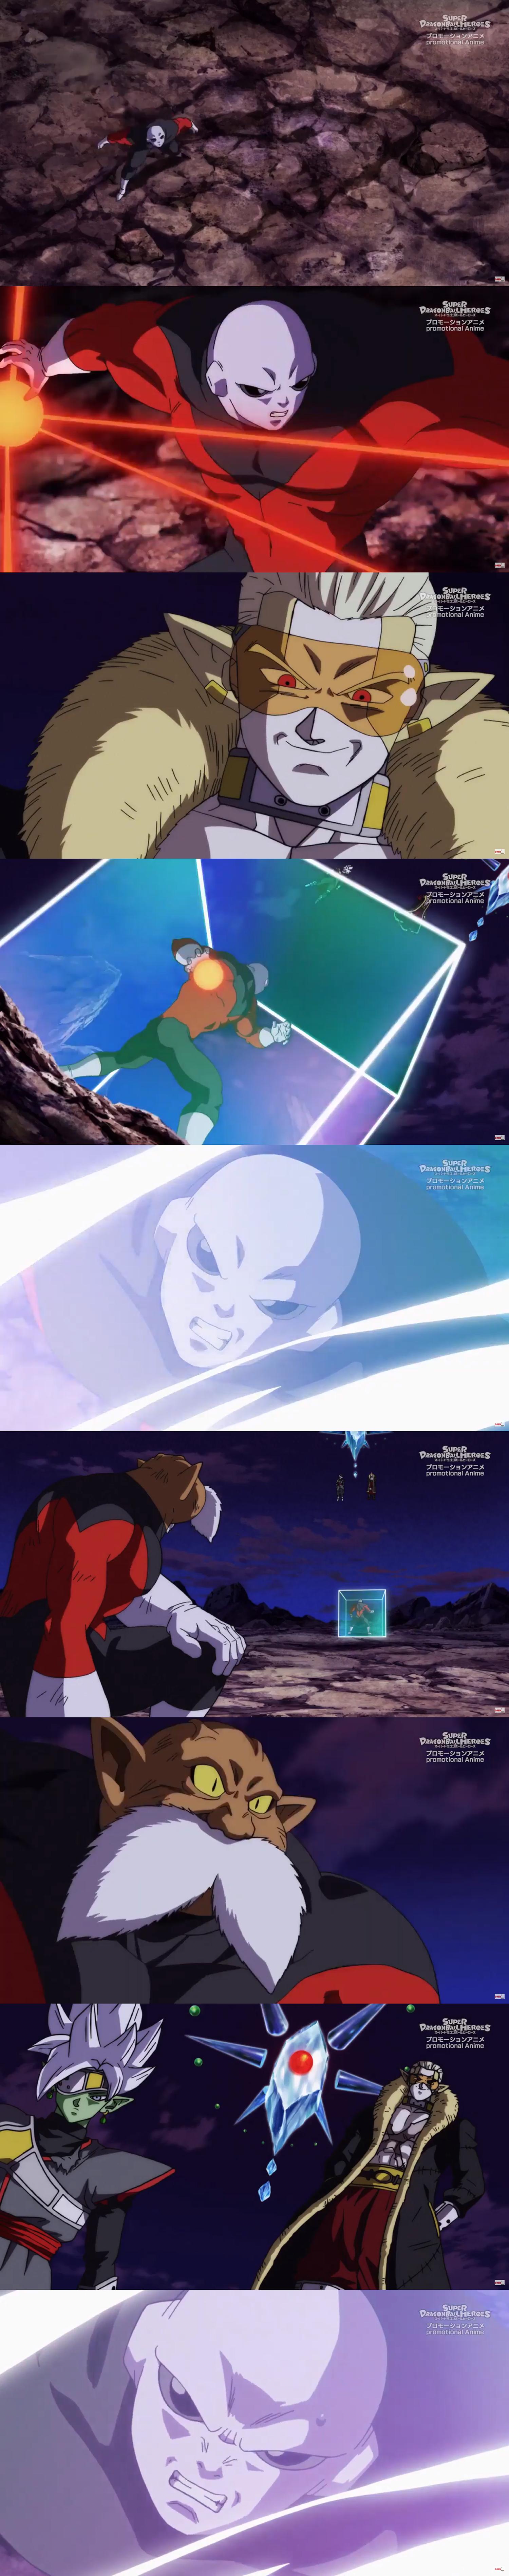 Super Dragon Ball Heroes Episode 11 Vostfr : super, dragon, heroes, episode, vostfr, Dragon, Ball:, Super, Heroes, Episode